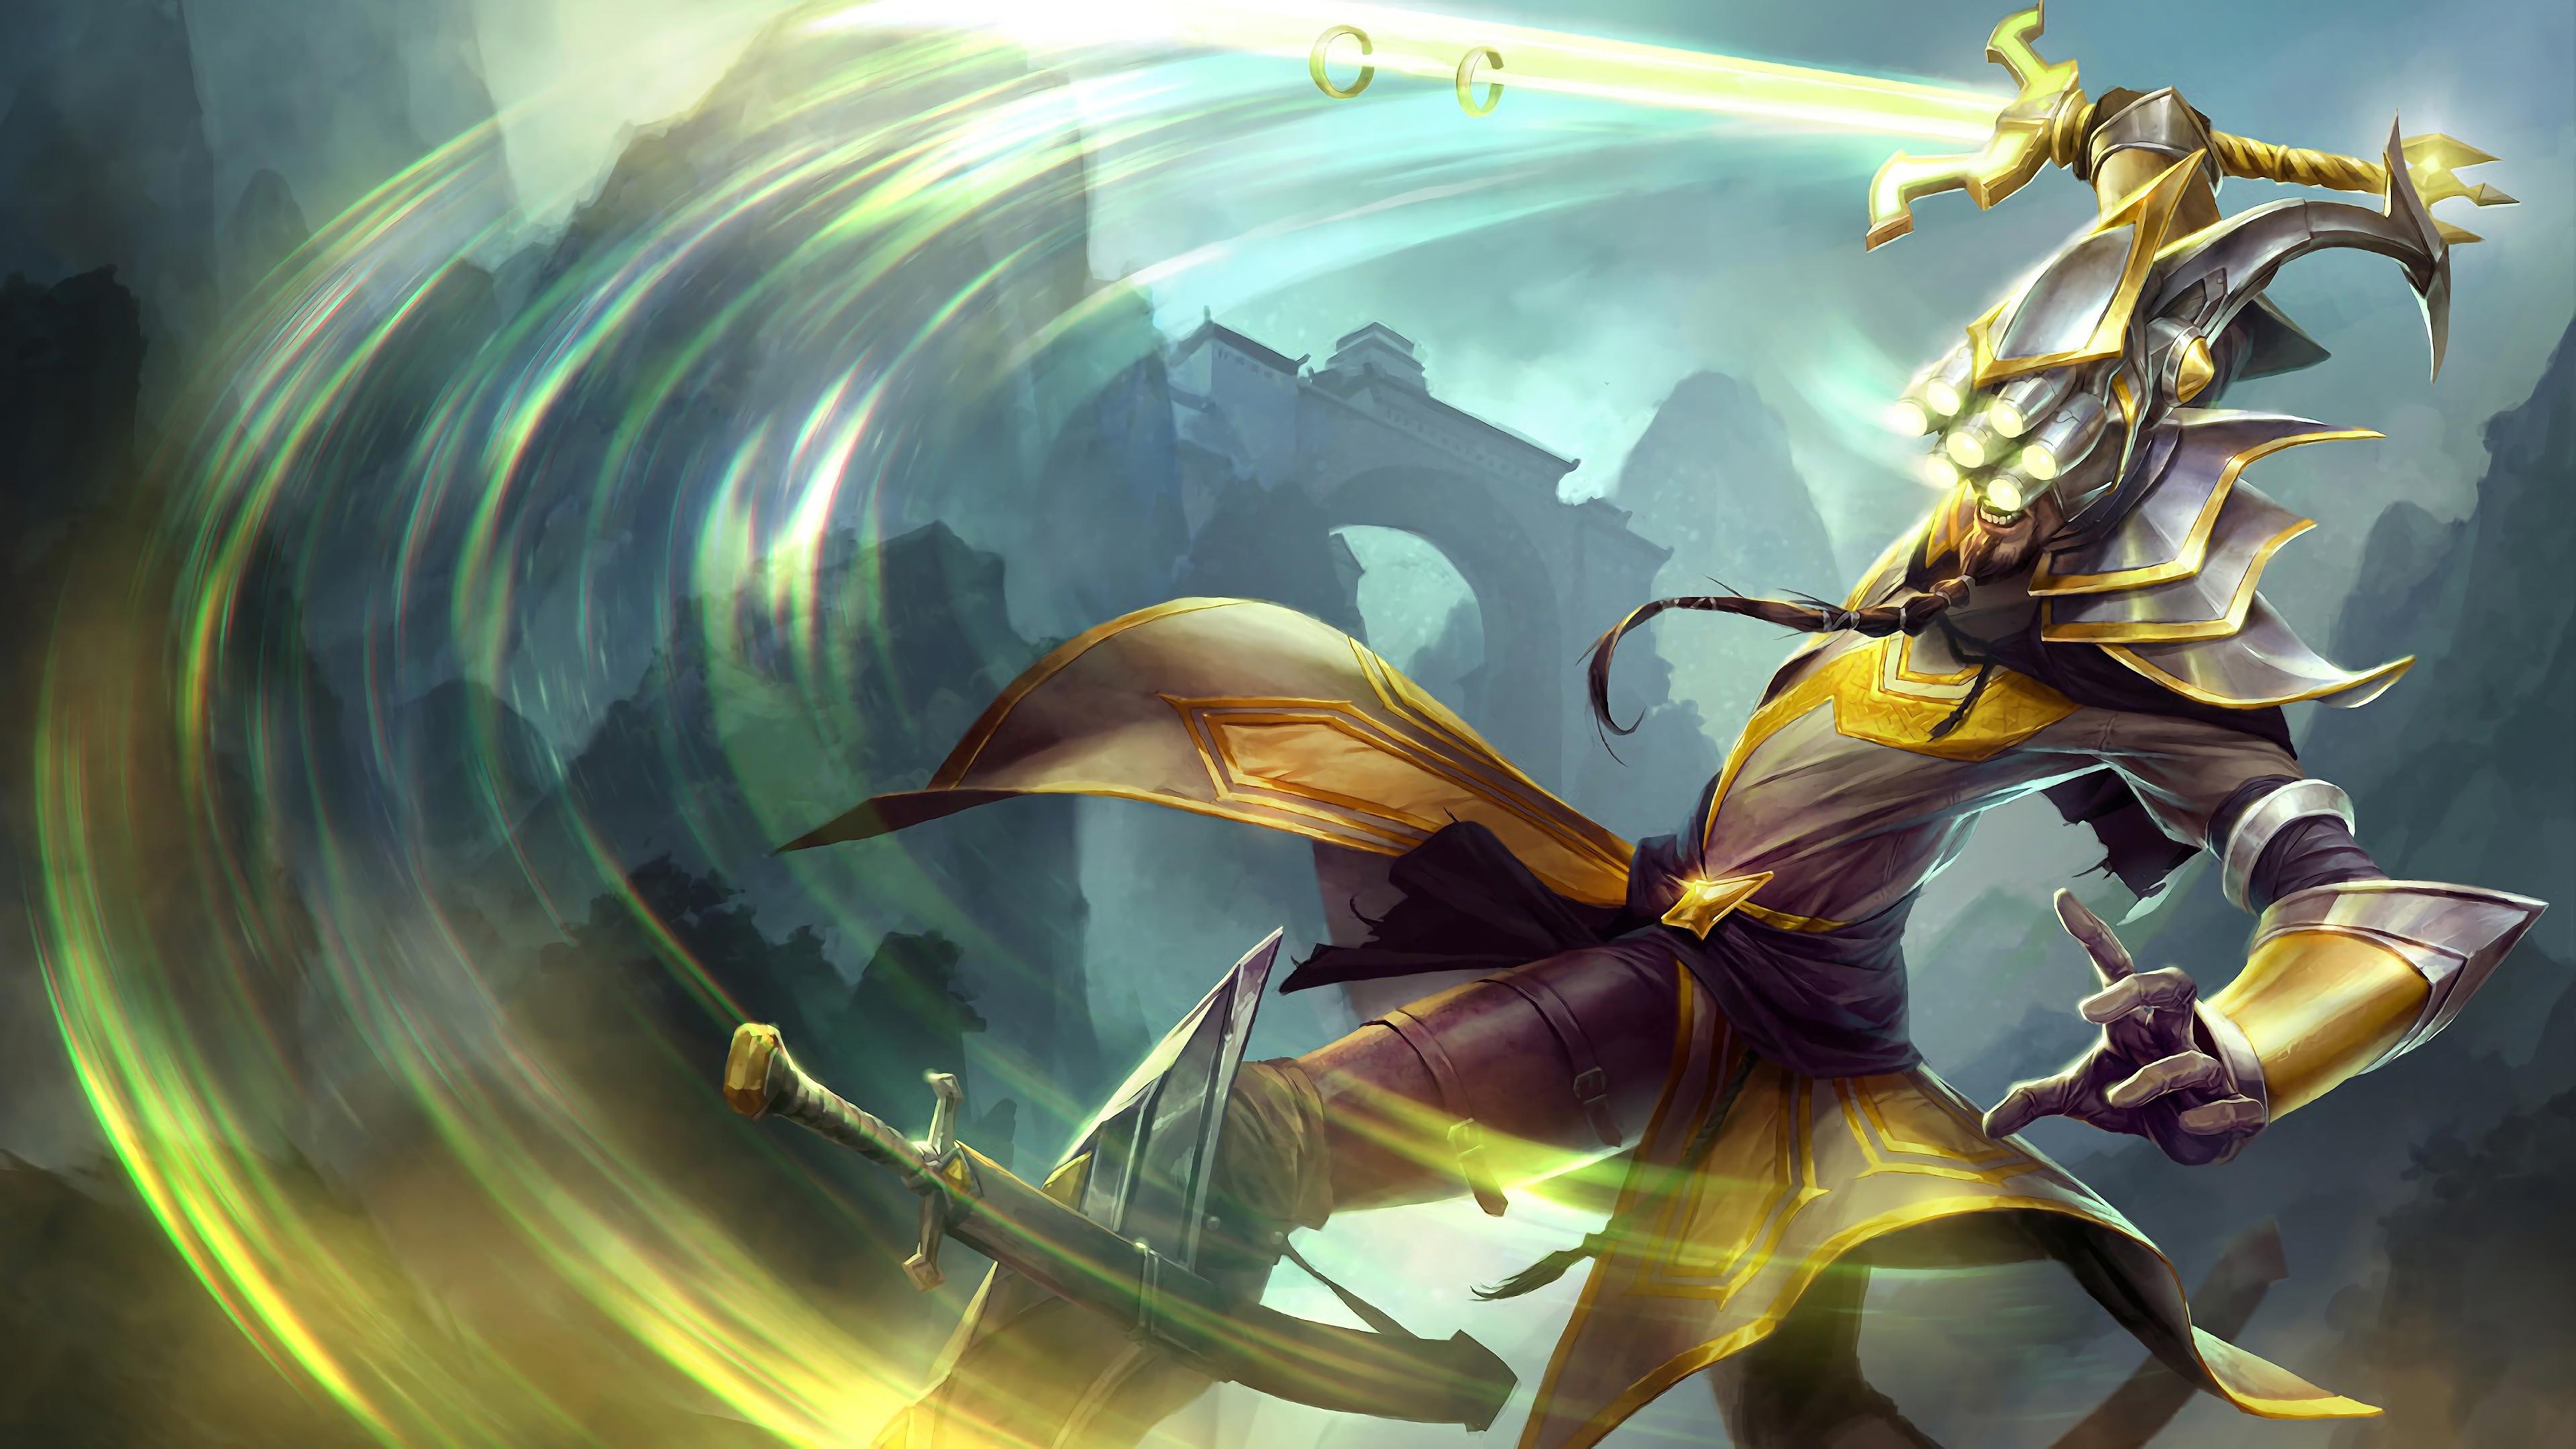 master yi lol splash art league of legends lol 1574102709 - Master Yi LoL Splash Art League of Legends lol - Master Yi, league of legends